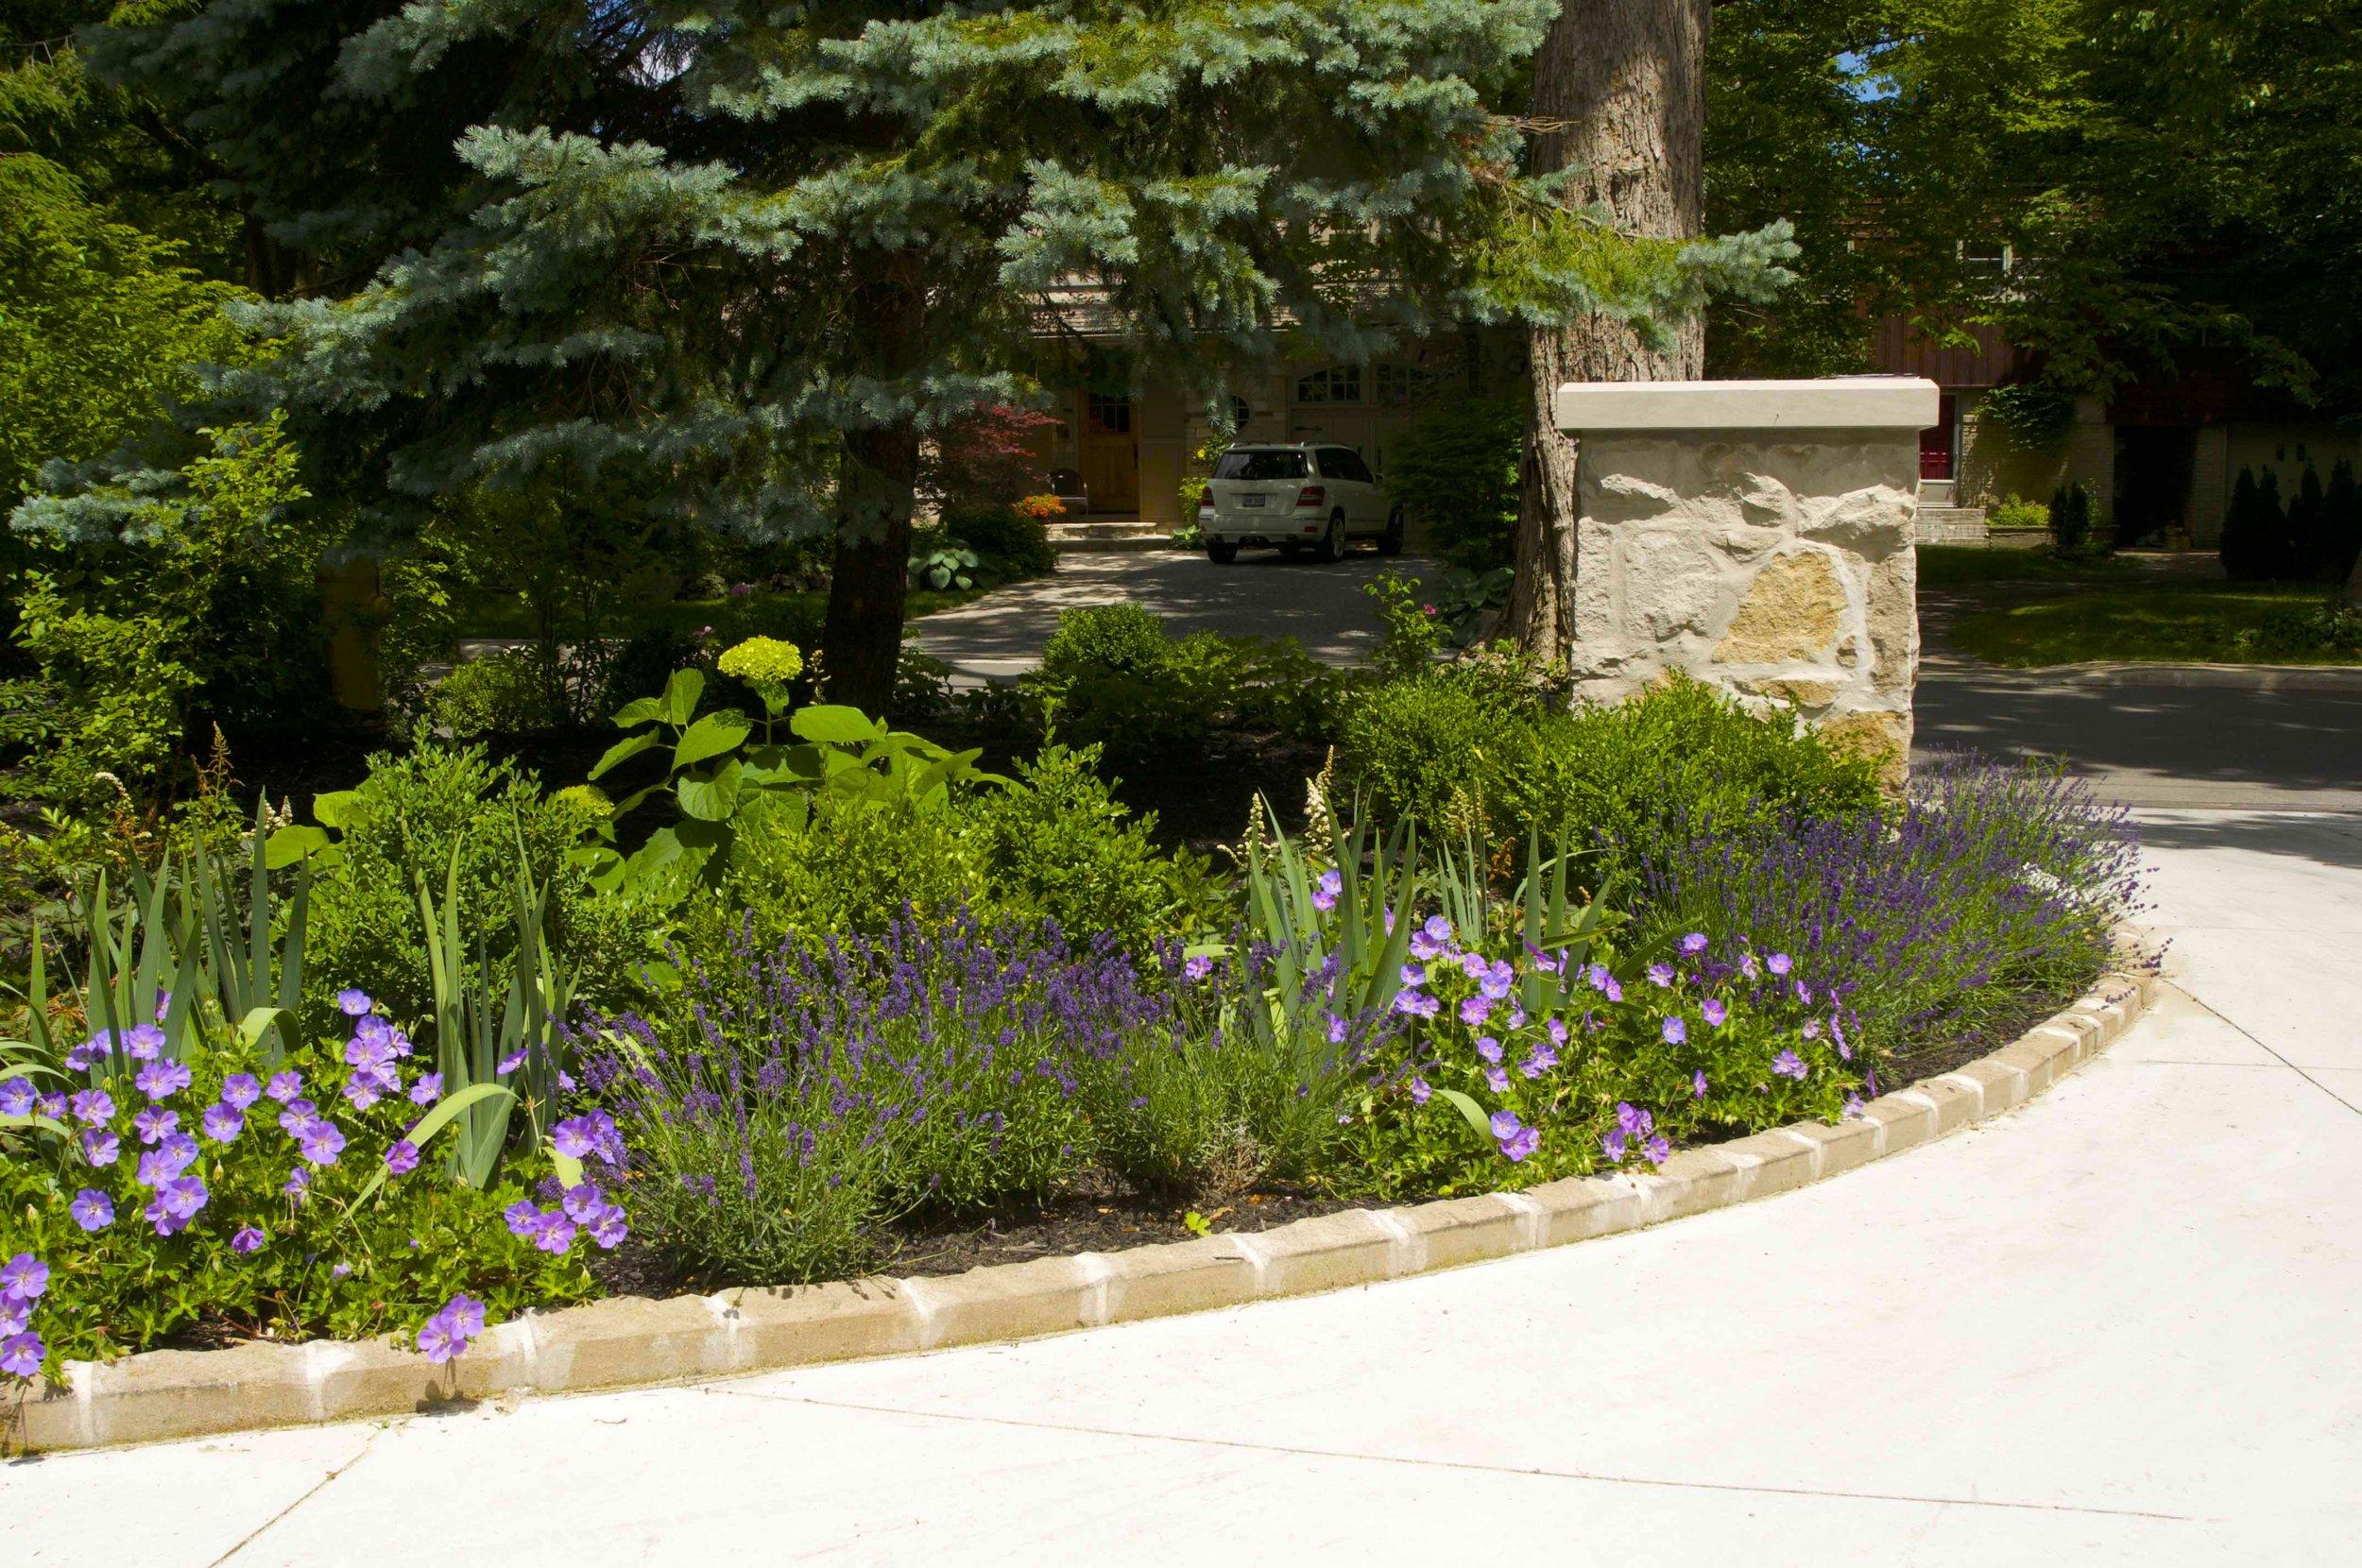 parkscpae, landscaping, custom, planting, pillar, indiana limestone, concrete driveway, toronto